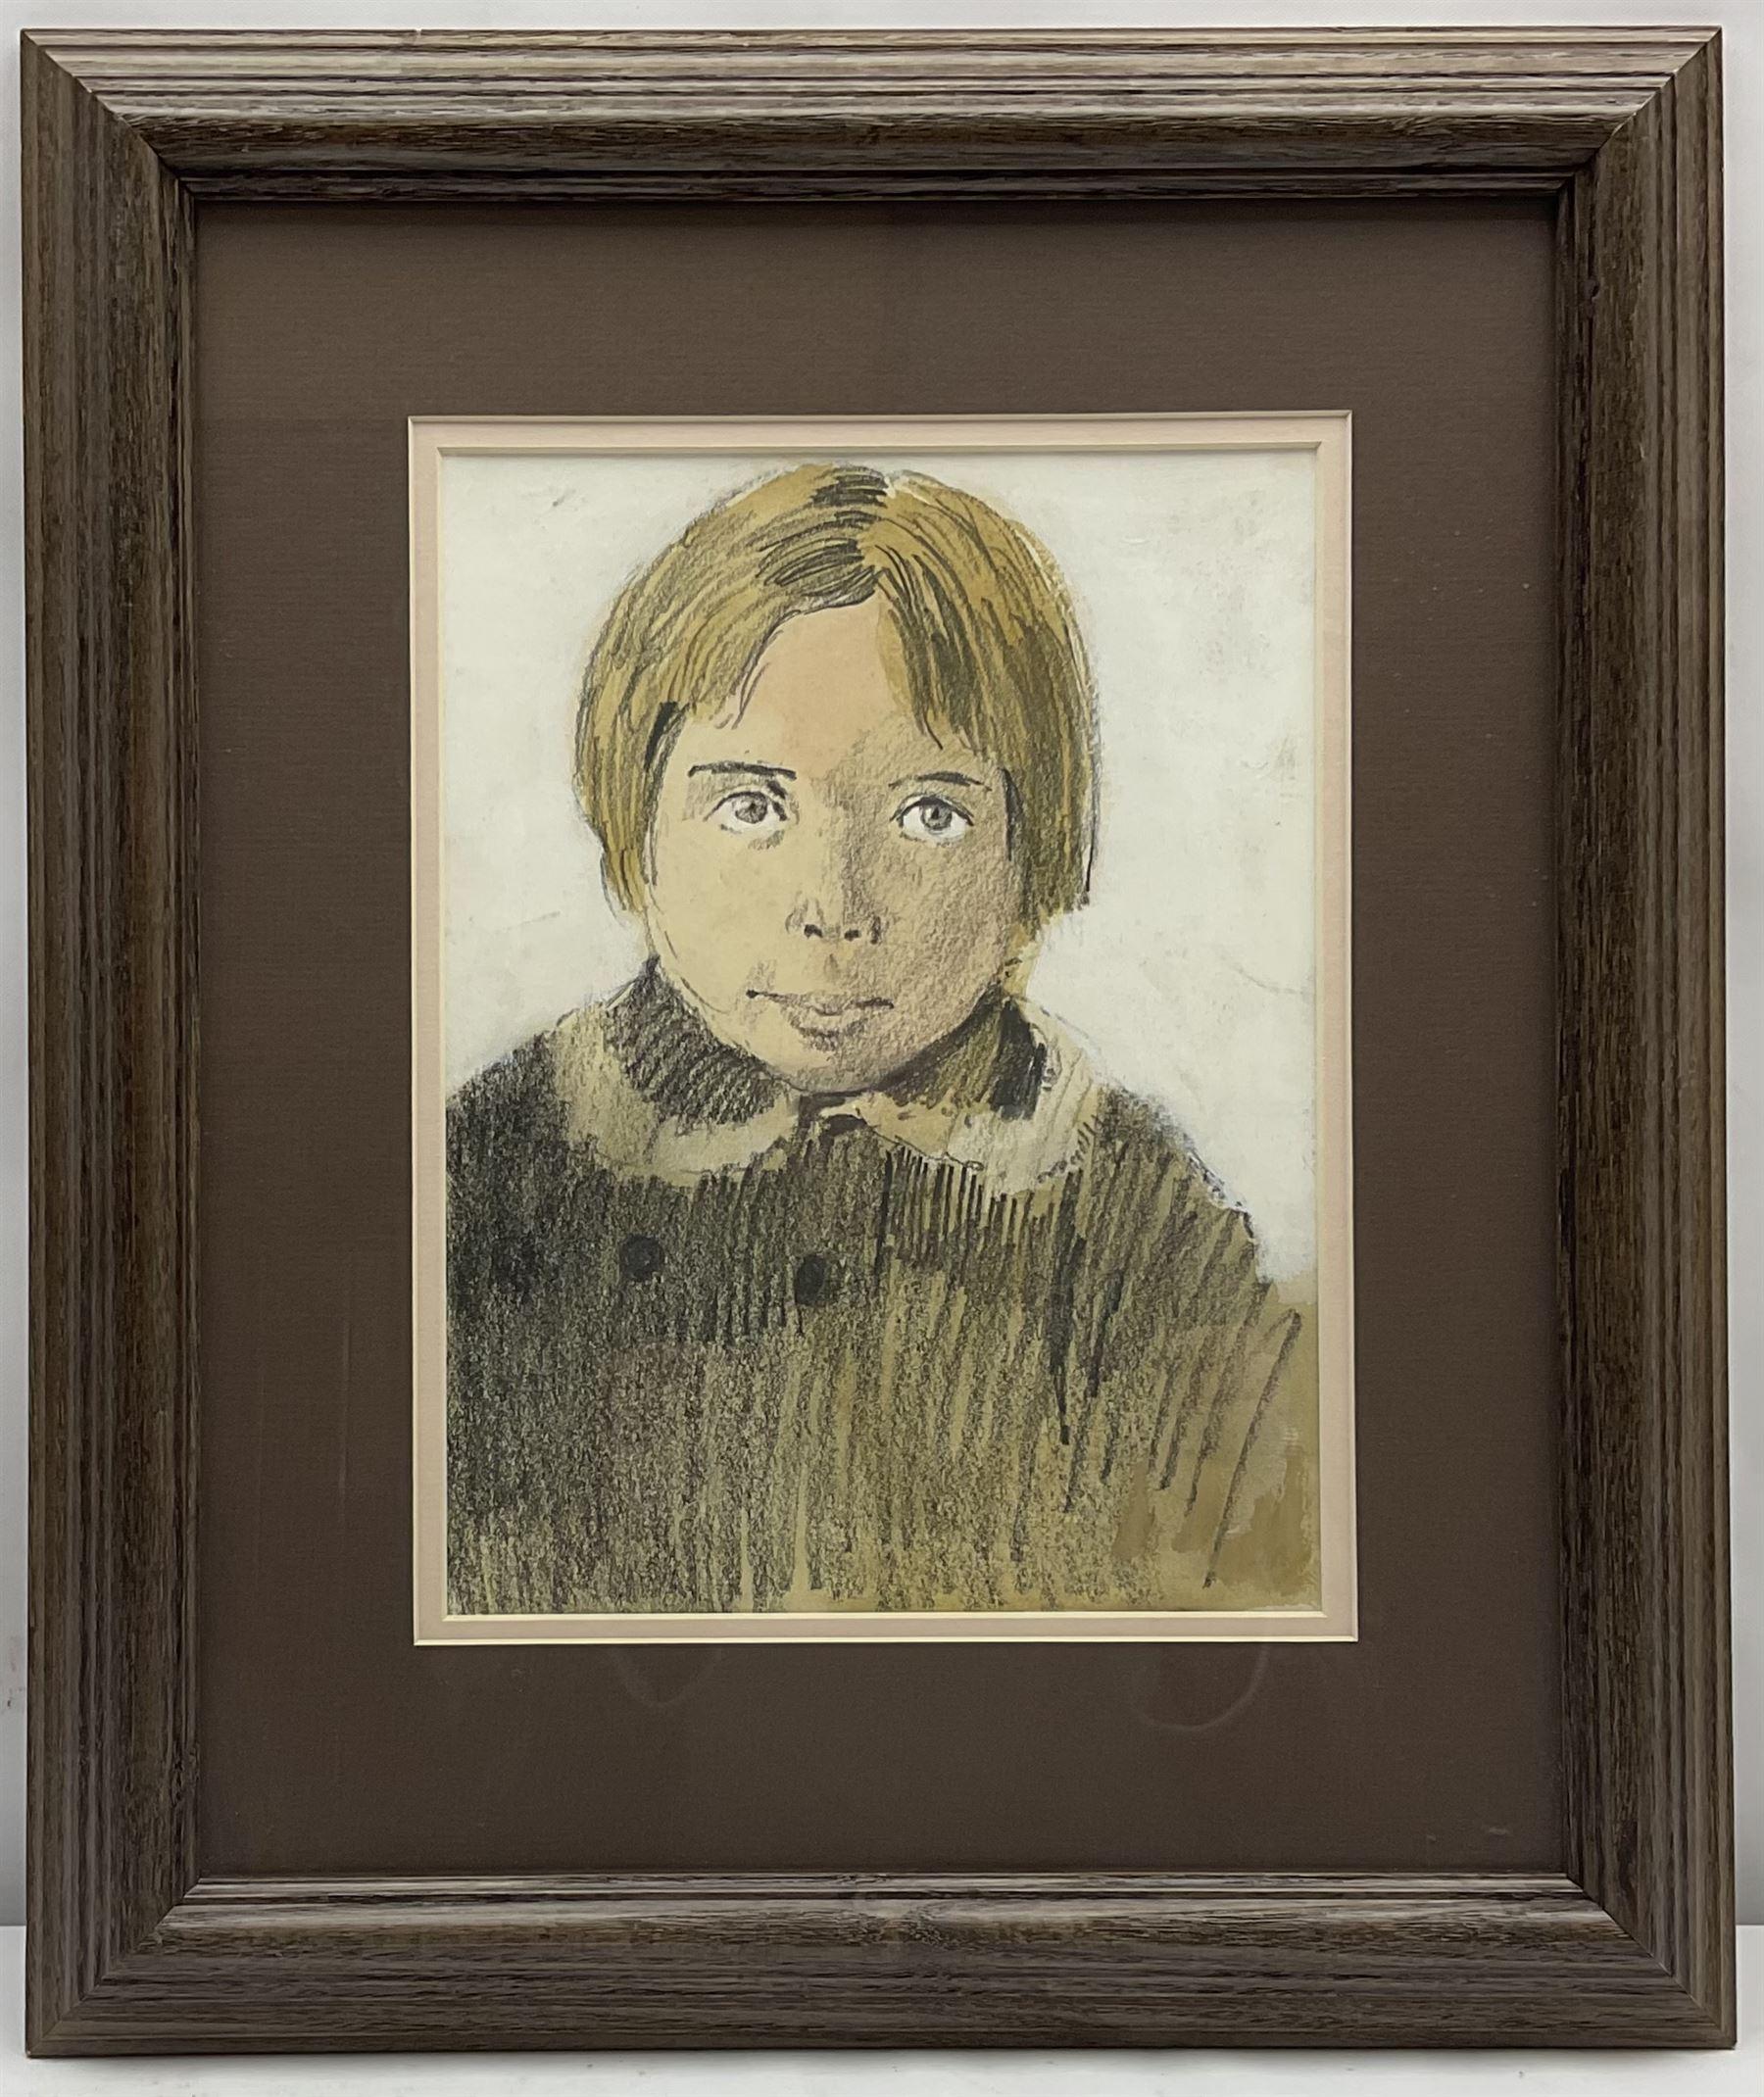 Donald McIntyre (British 1923-2009): 'Blond Boy Wearing Coat' - Image 2 of 3